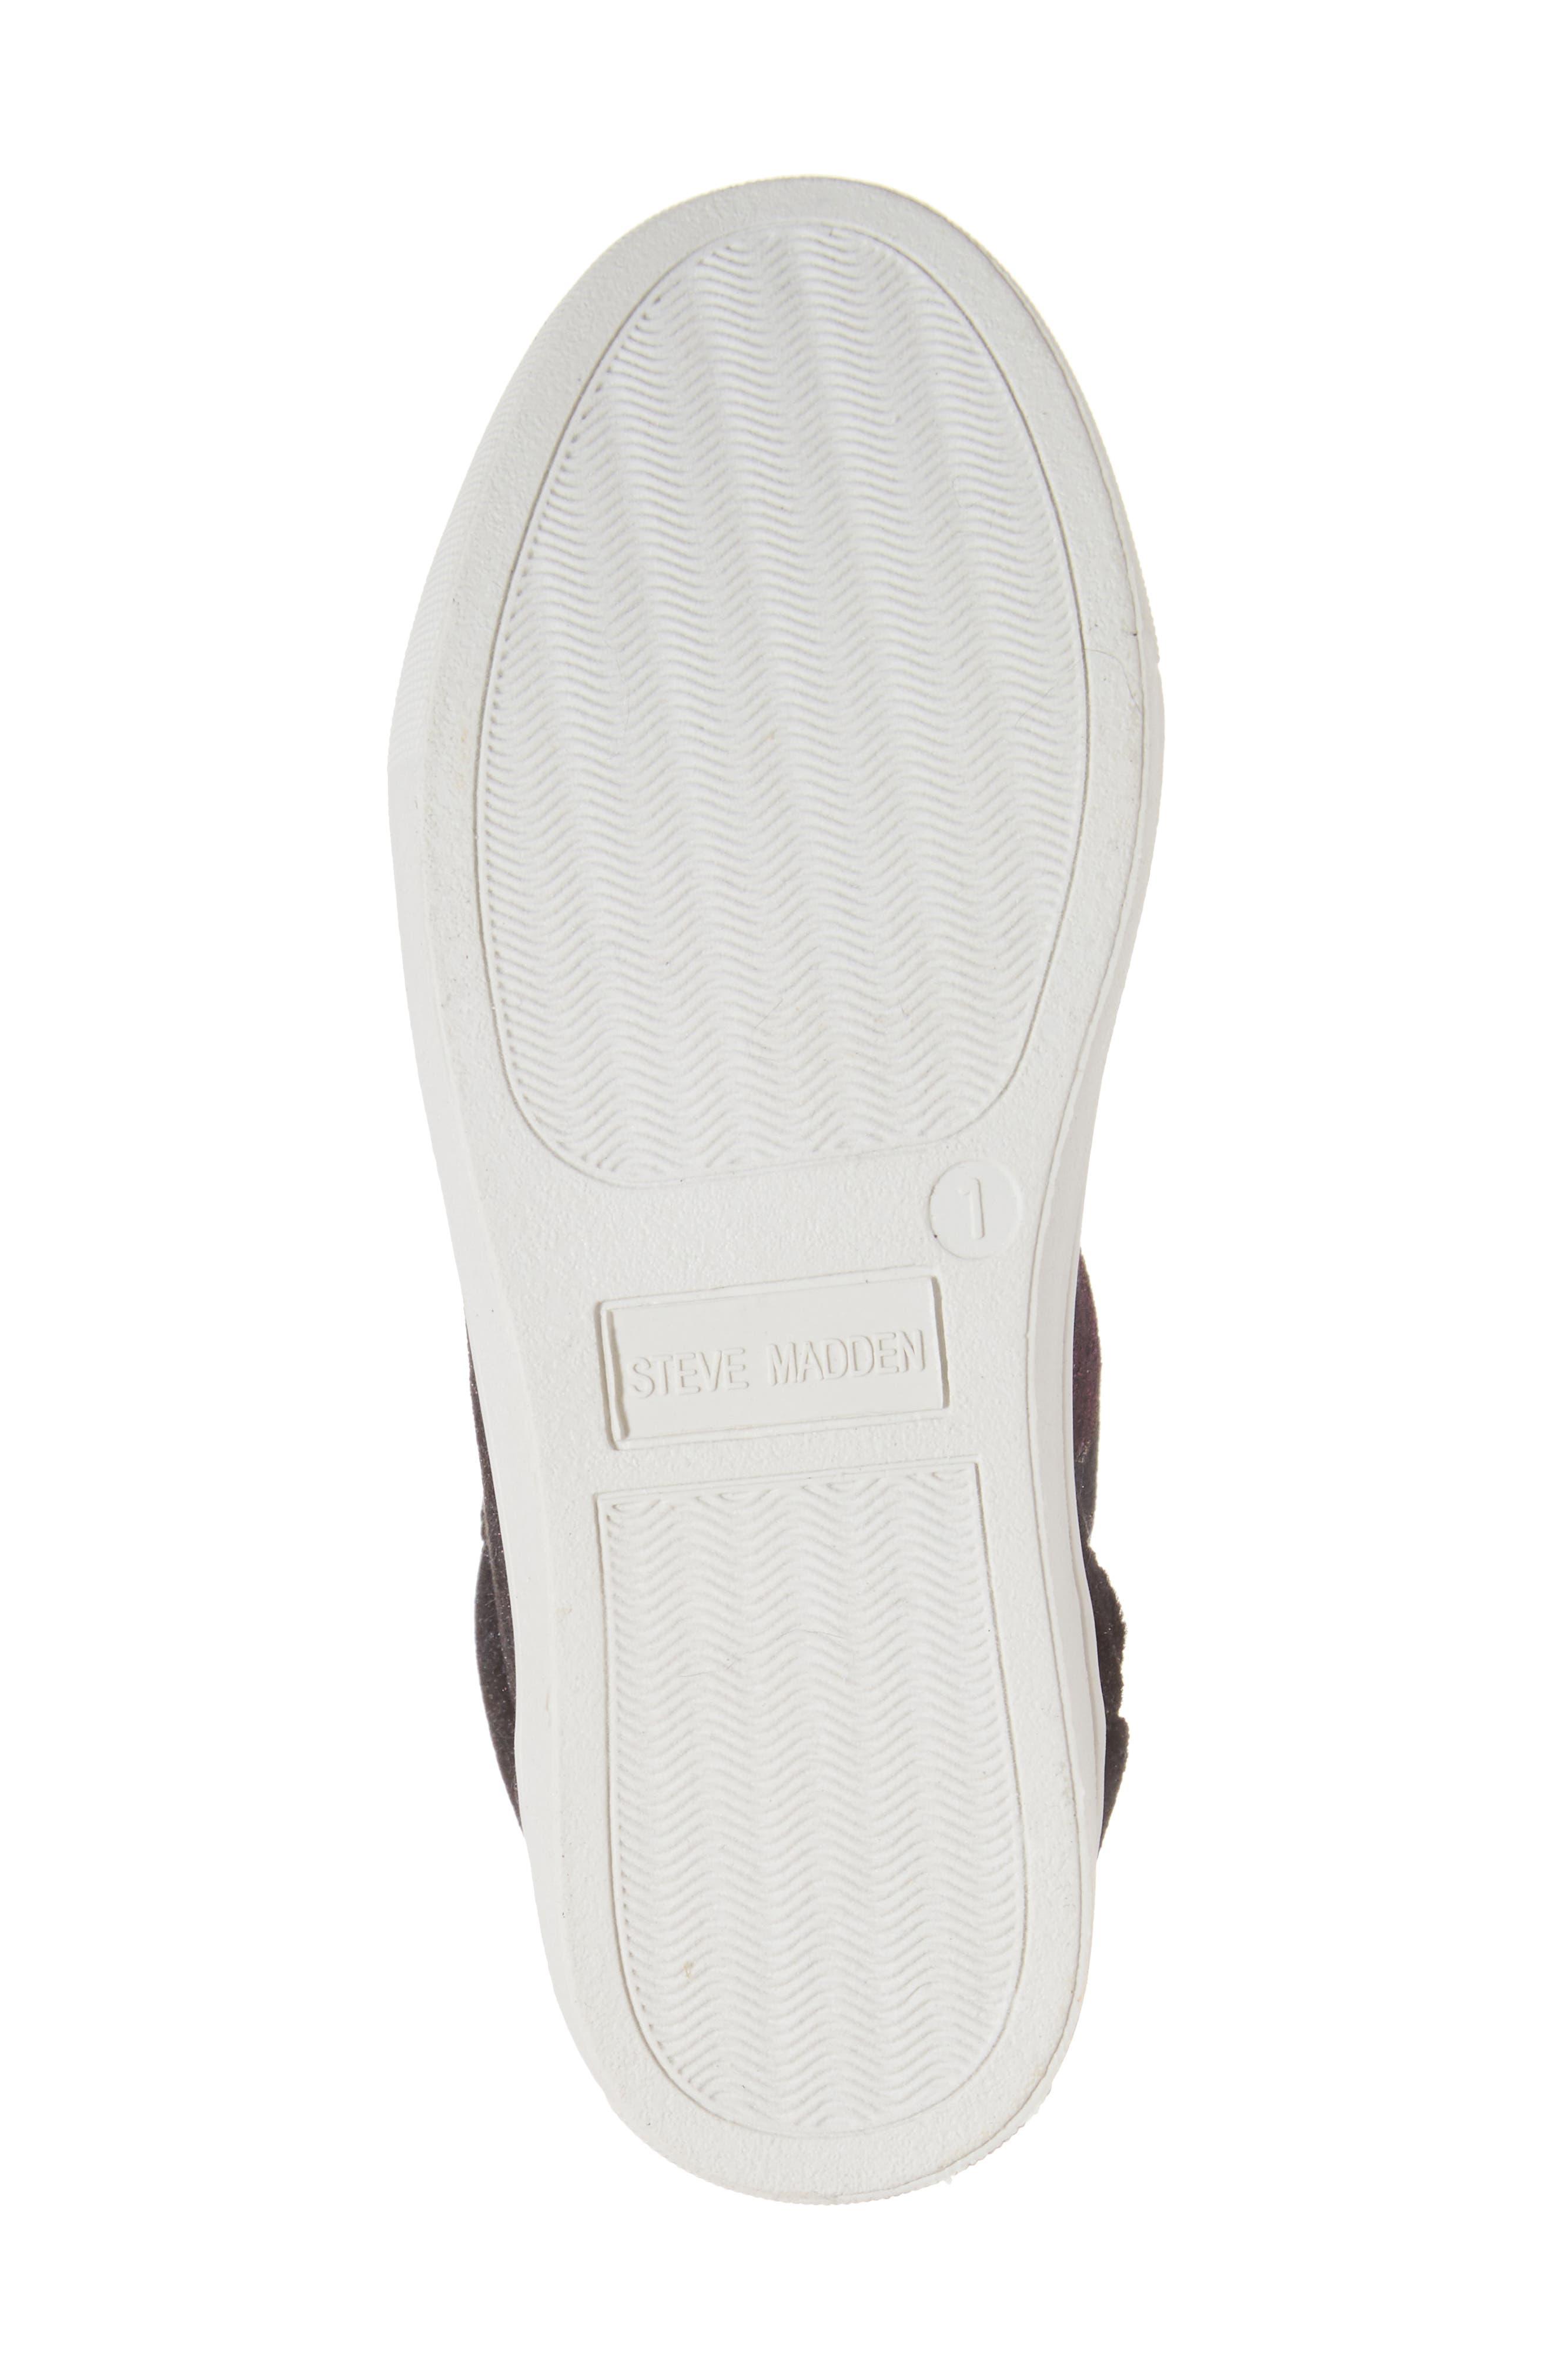 JBrielle High Top Sneaker,                             Alternate thumbnail 6, color,                             015